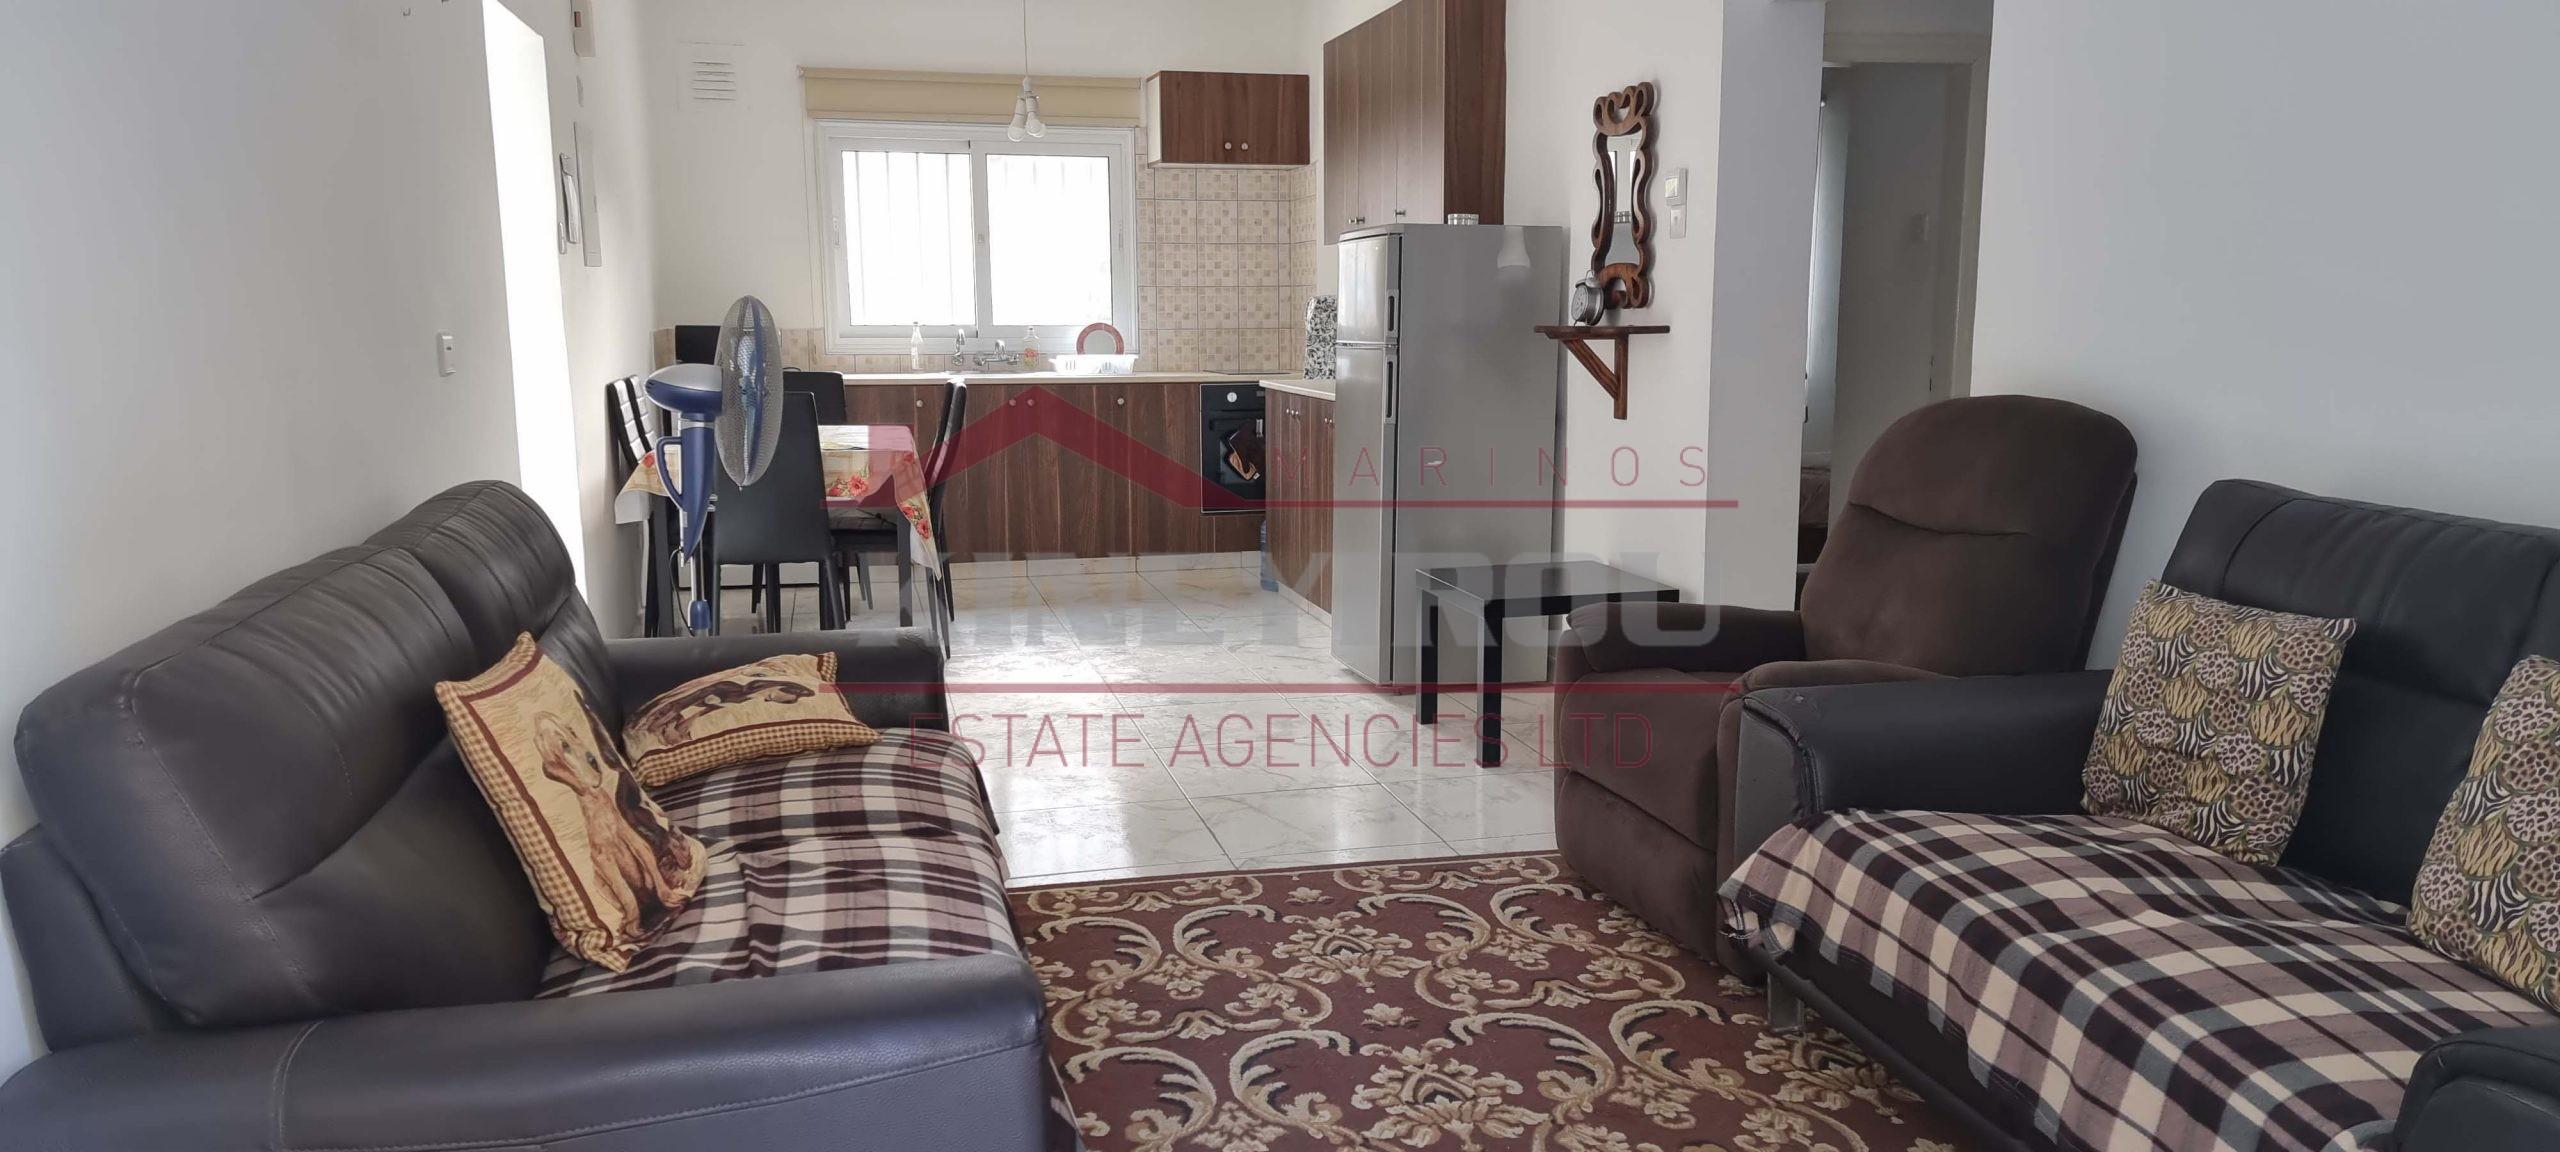 2 bedroom apartment in American Academy, Larnaca